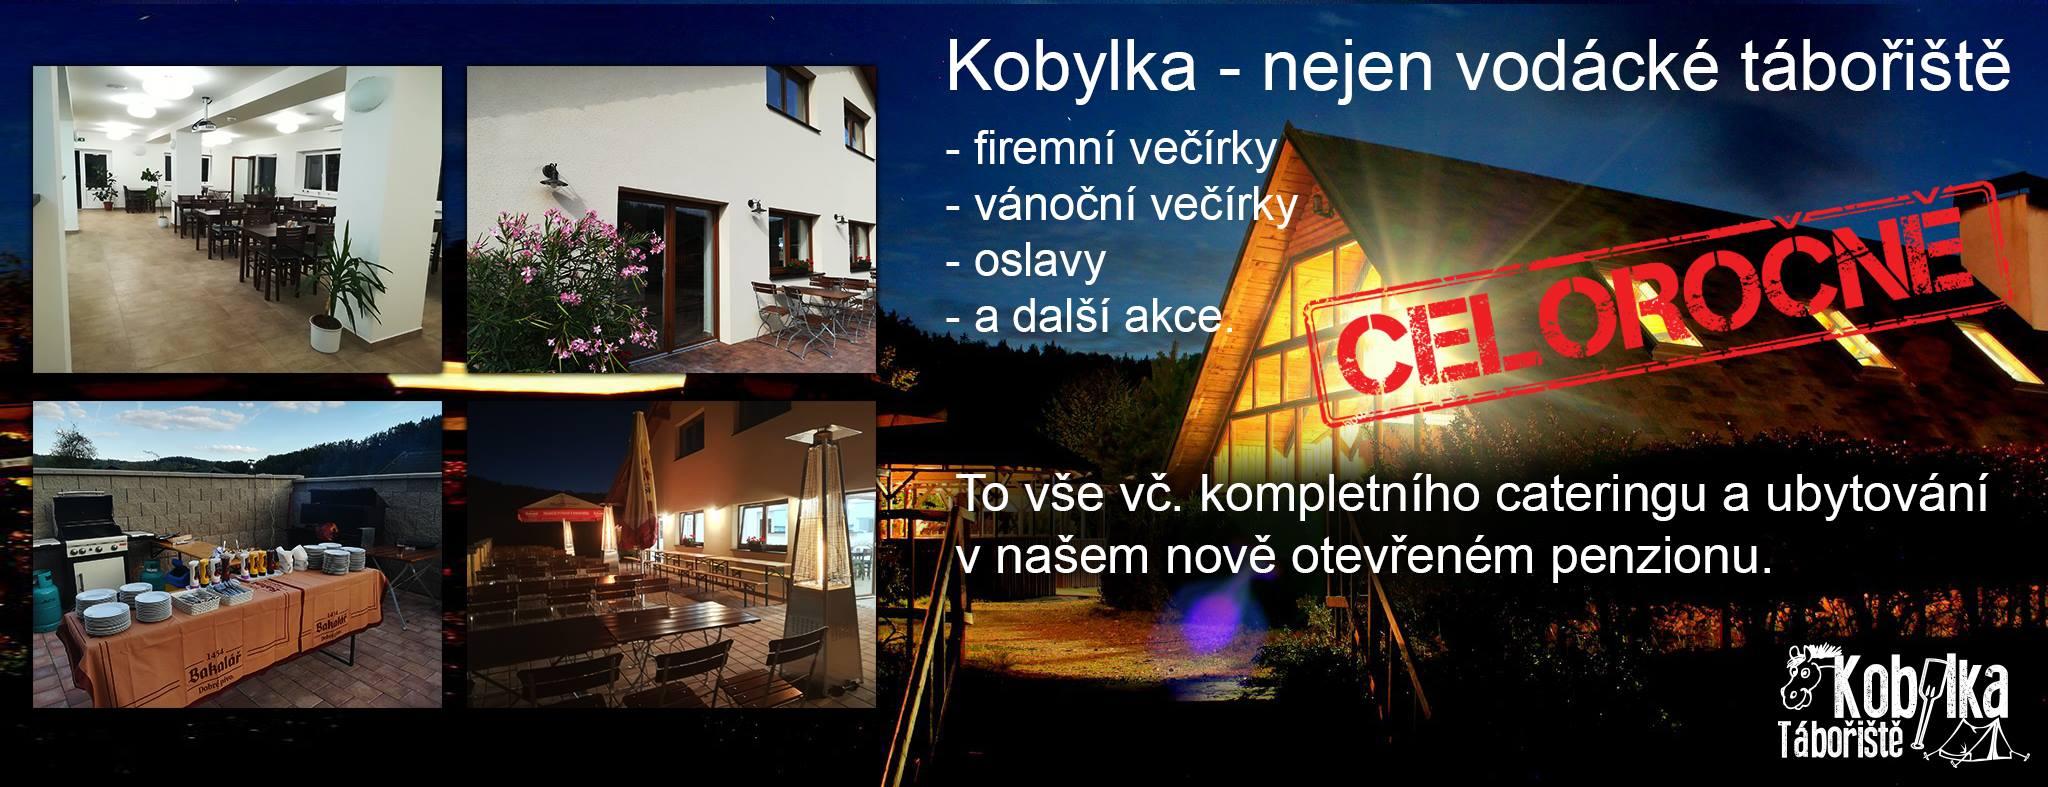 Taboriste Kobylka